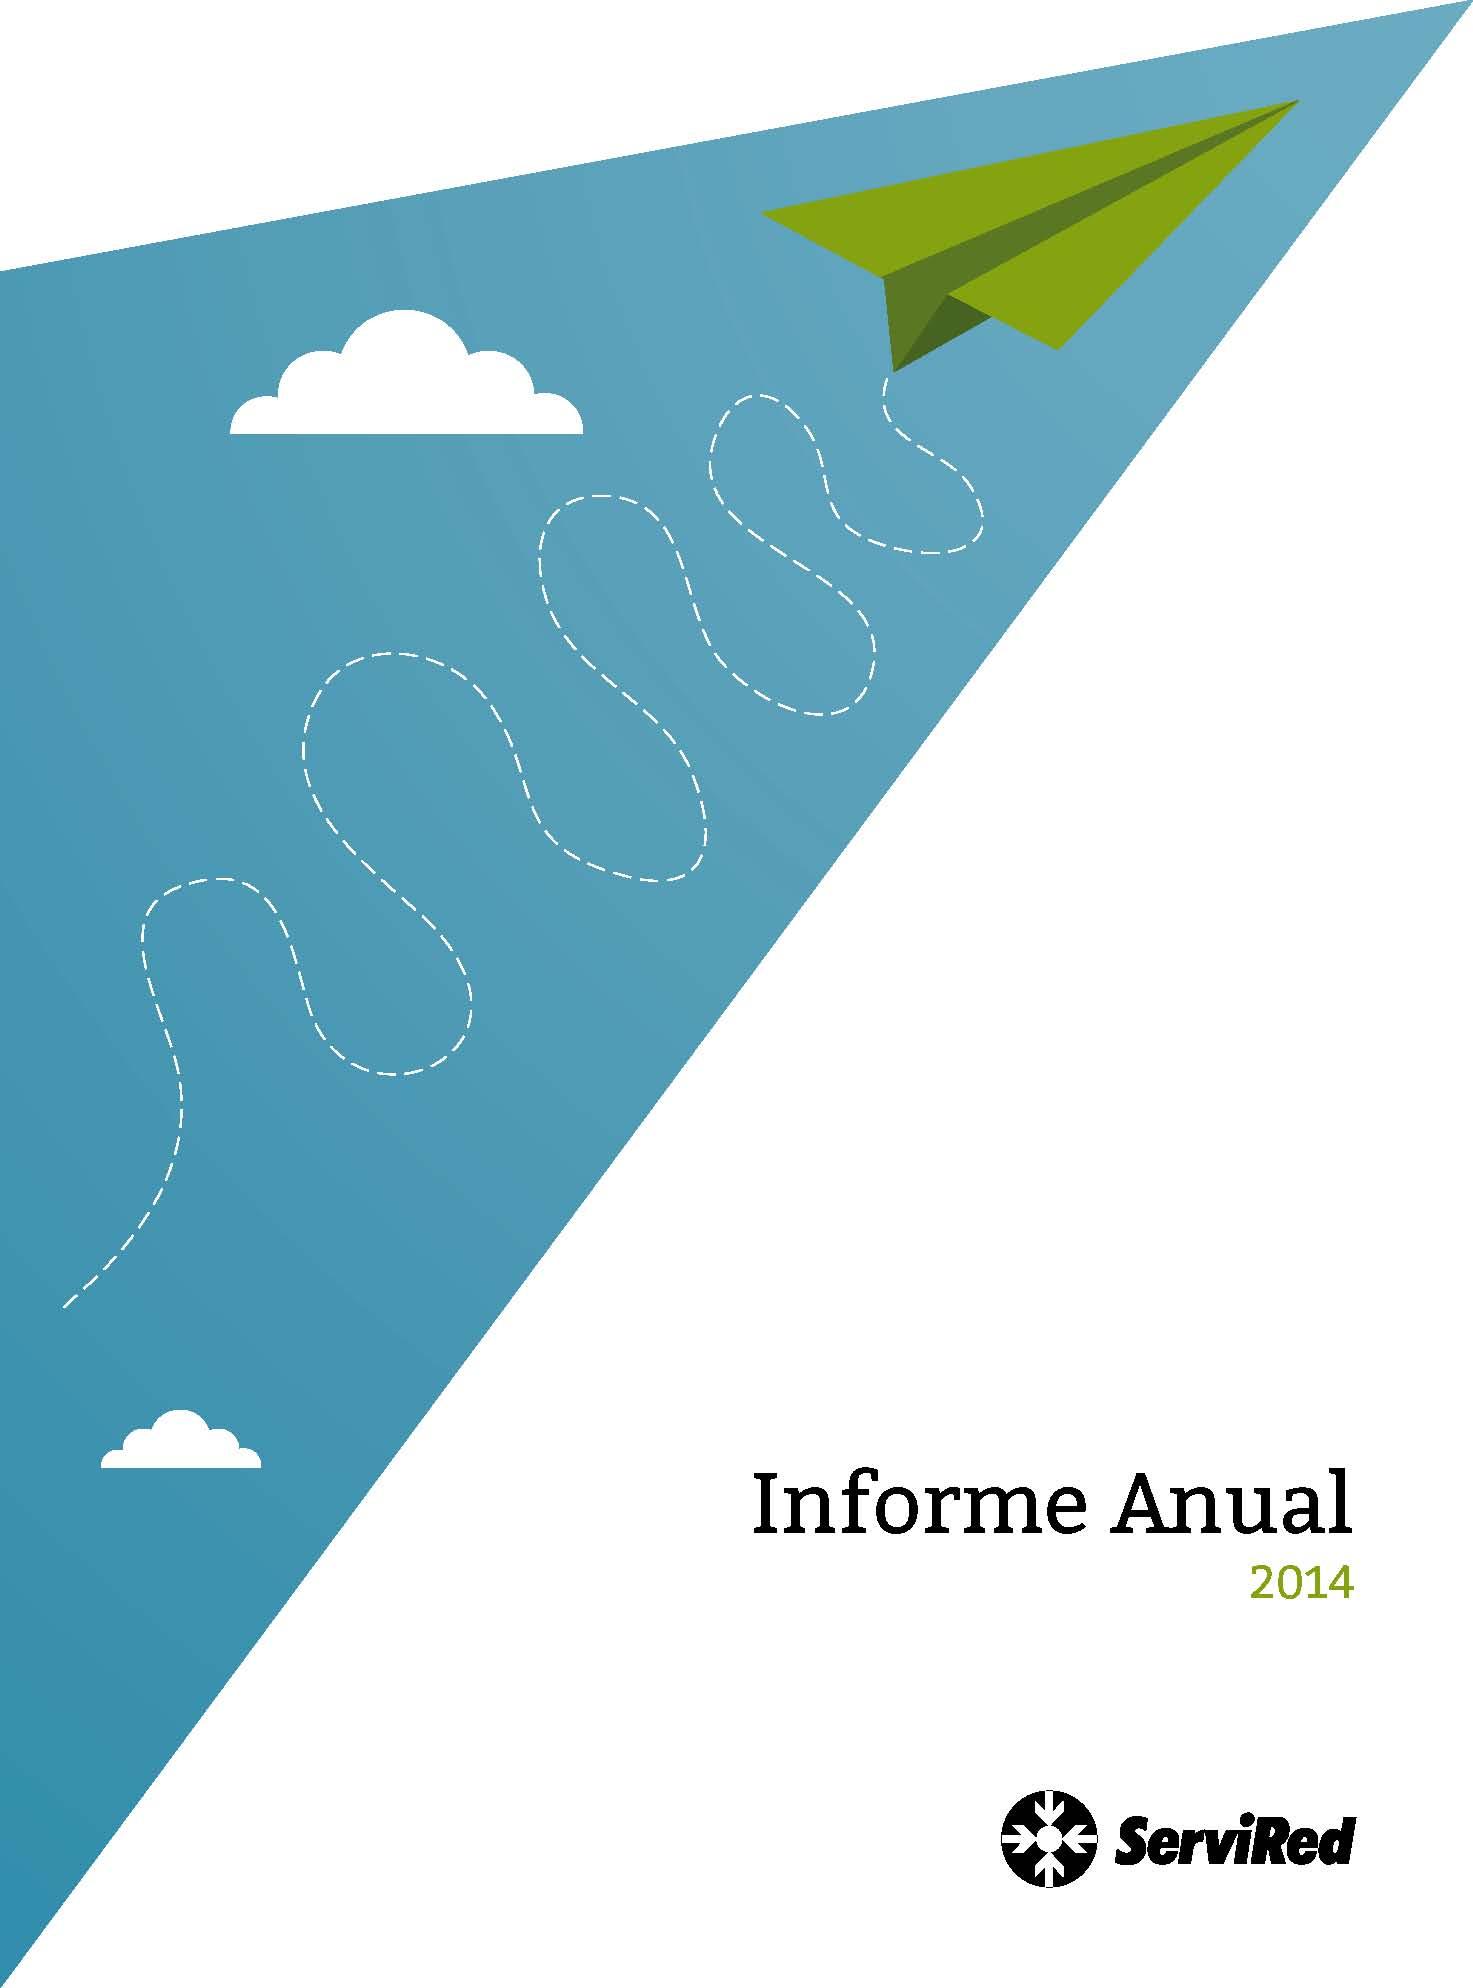 Informe-Anual-ServiRed_2014 Portada